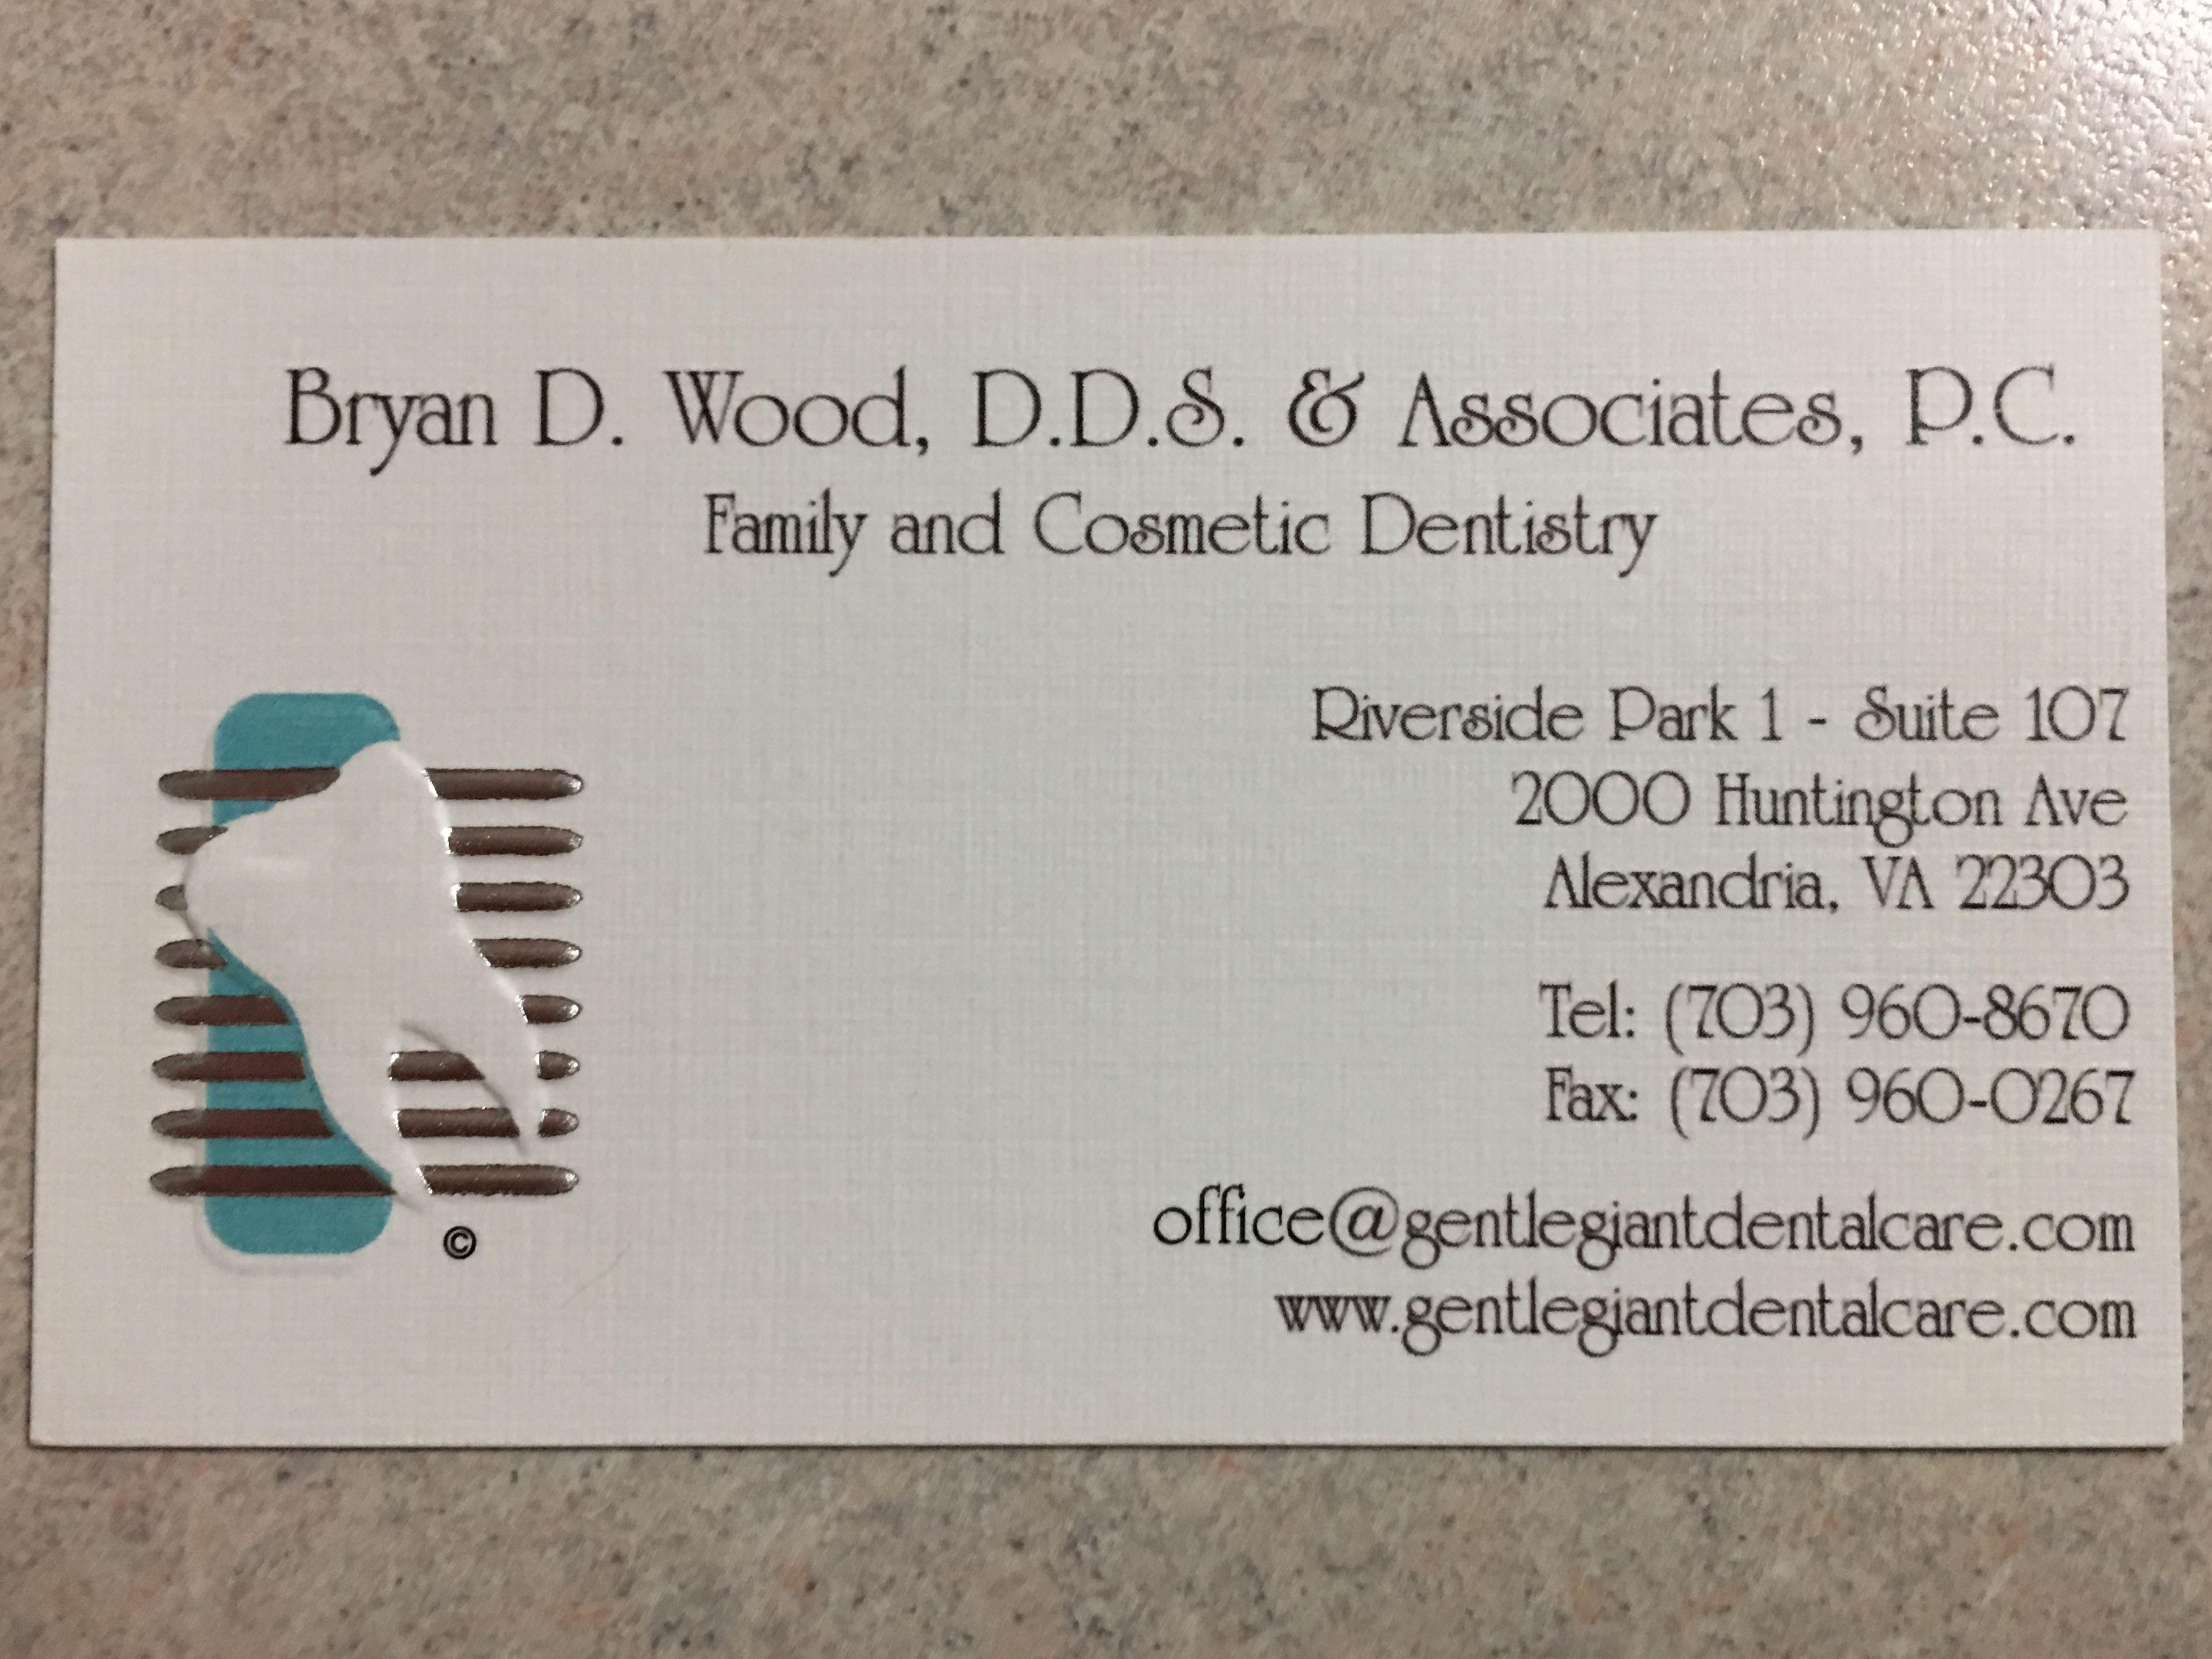 Bryan D. Wood D.D.S. and Associates's avatar'